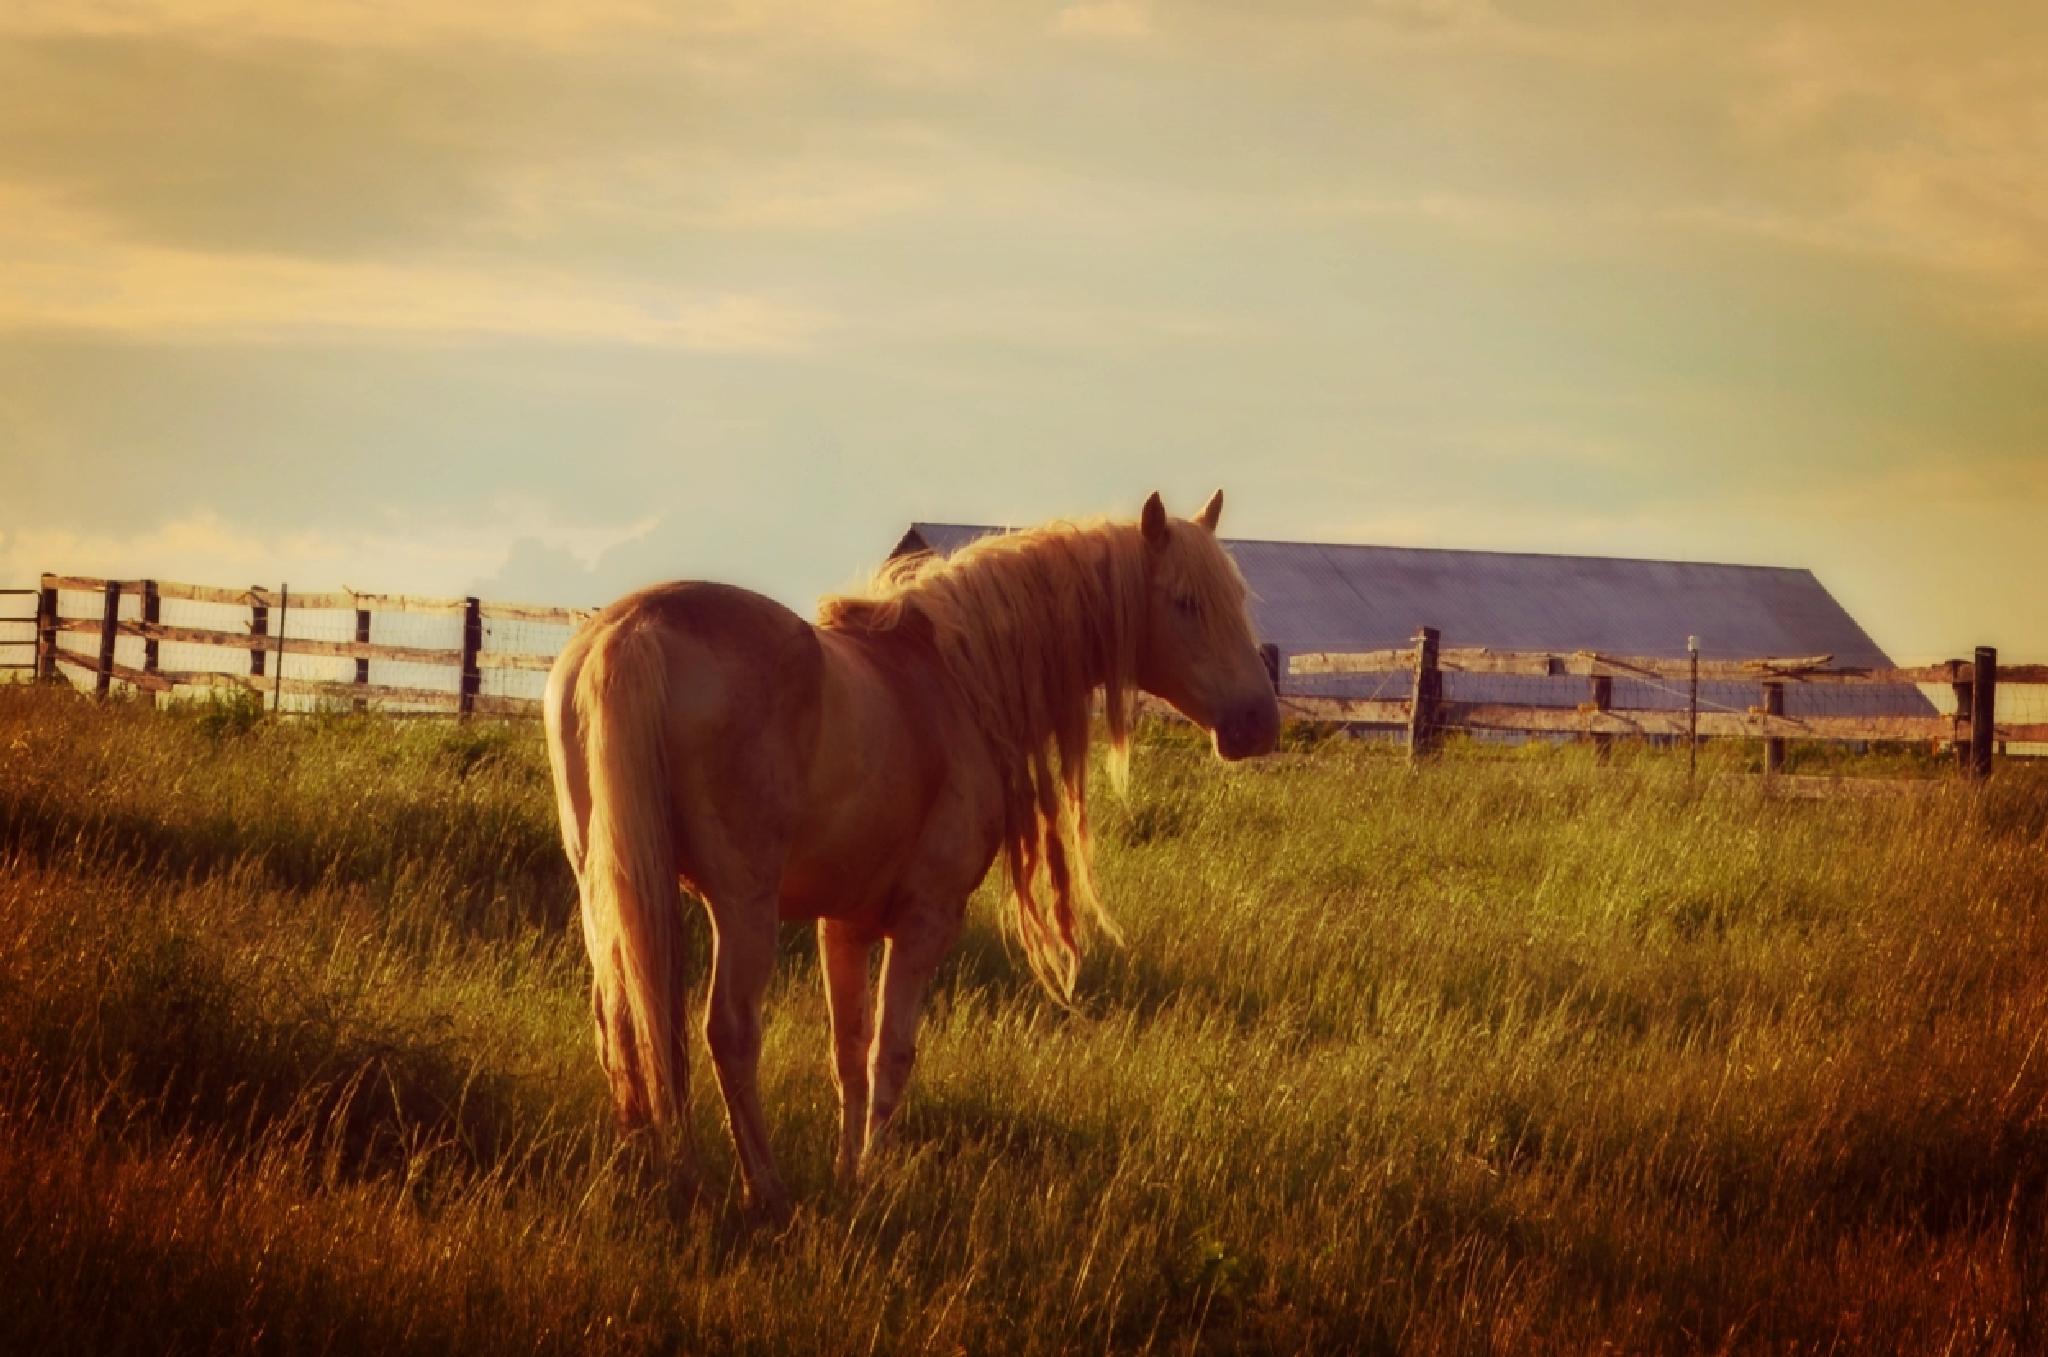 Champagne, Rocky mountain stallion, Kentucky USA by greenmountaingirl